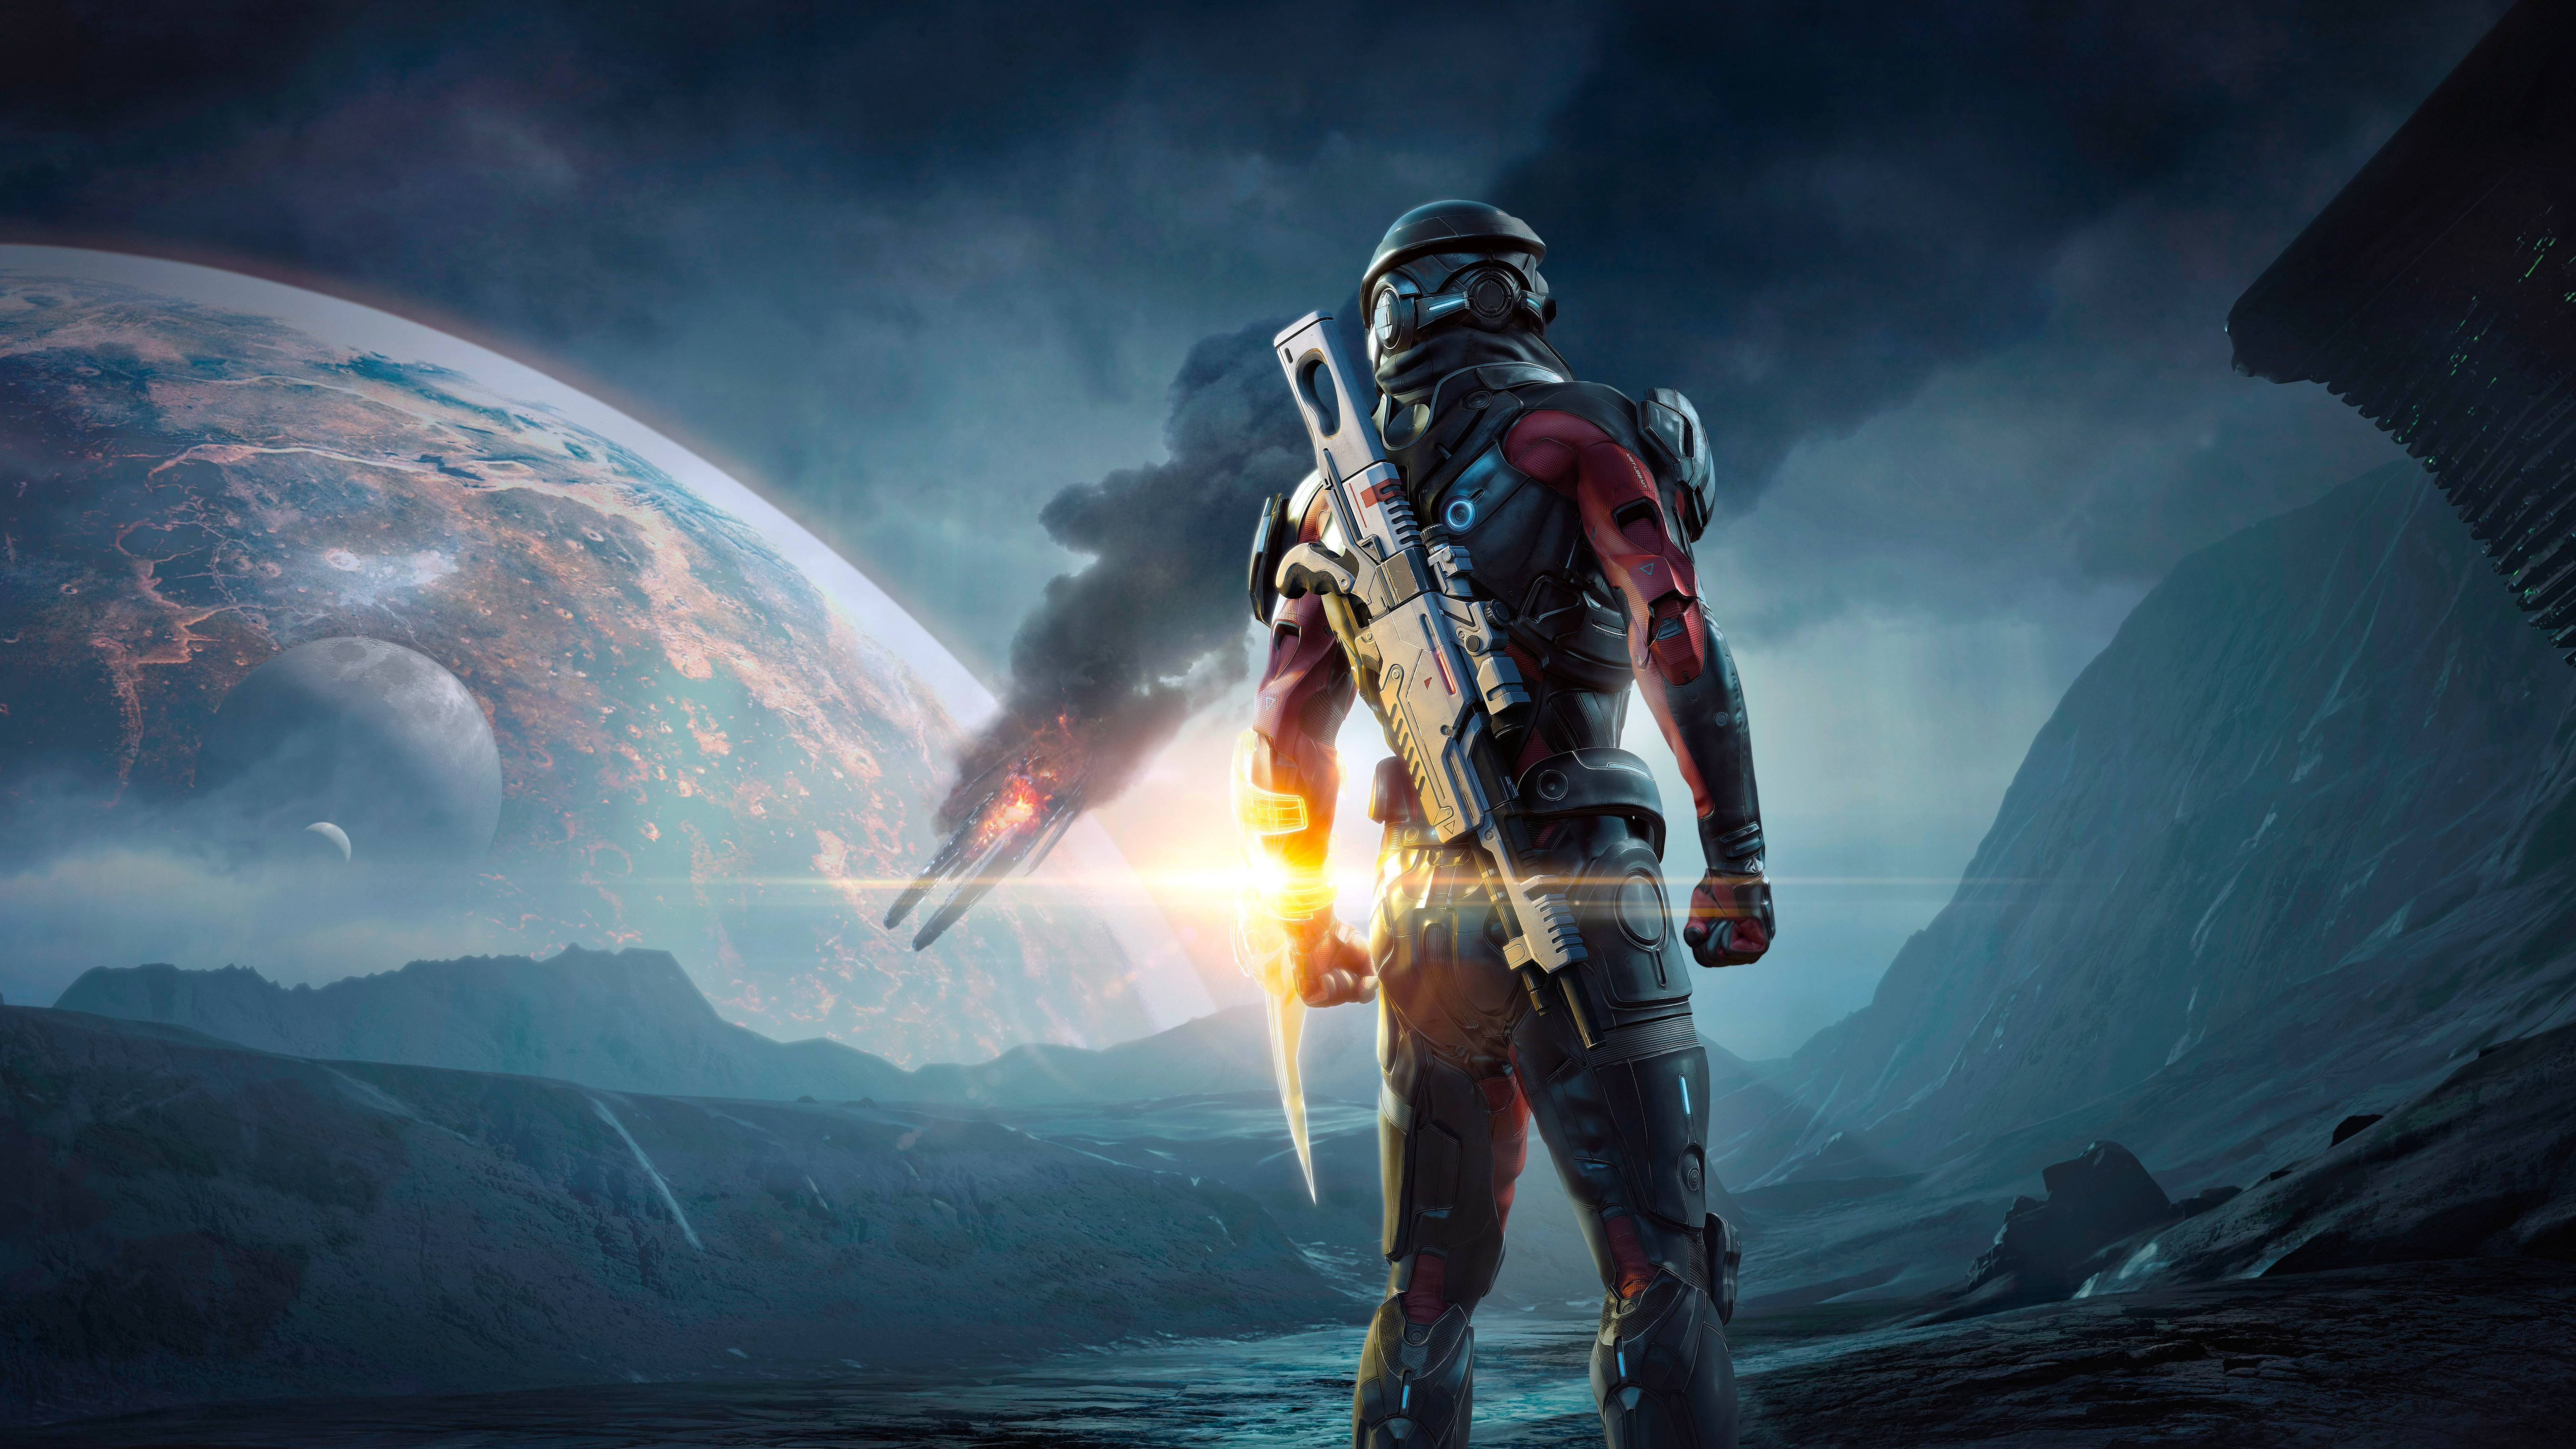 Mass Effect Andromeda Desktop Wallpaper: Mass Wallpapers, Photos And Desktop Backgrounds Up To 8K